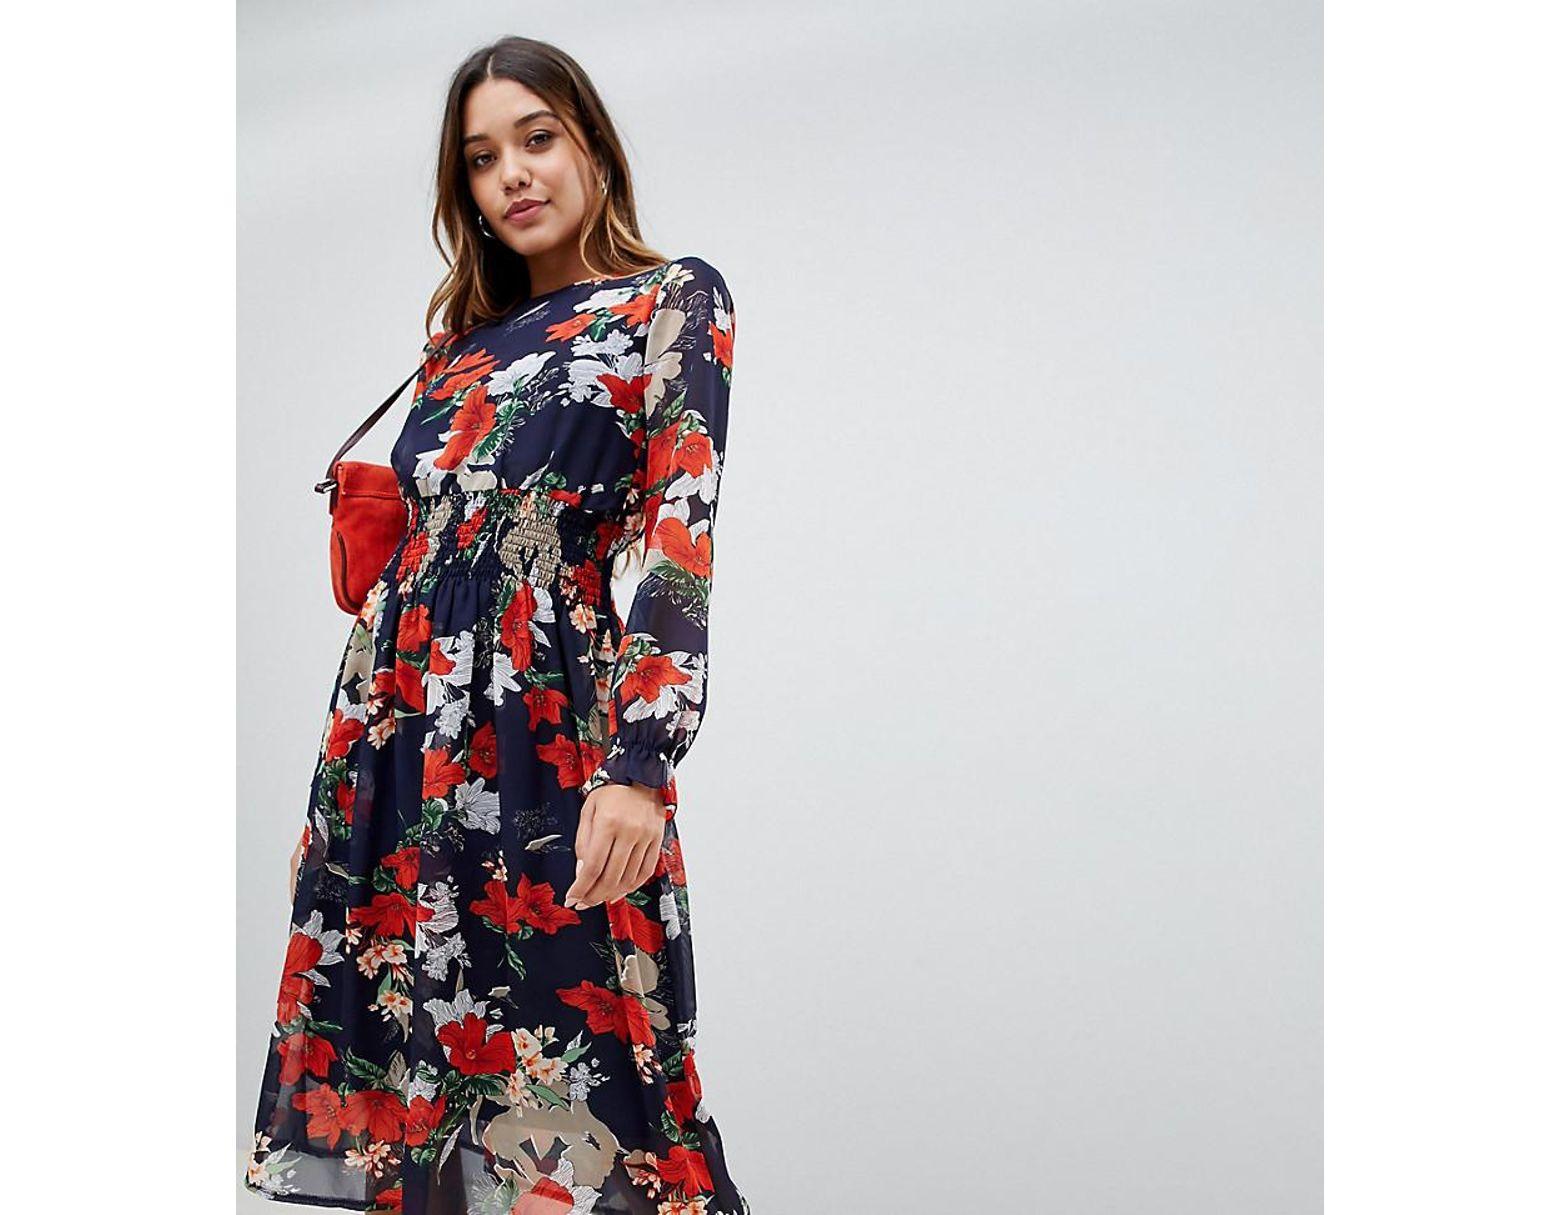 93344632c29c4 Boohoo High Neck Floral Midi Dress - raveitsafe